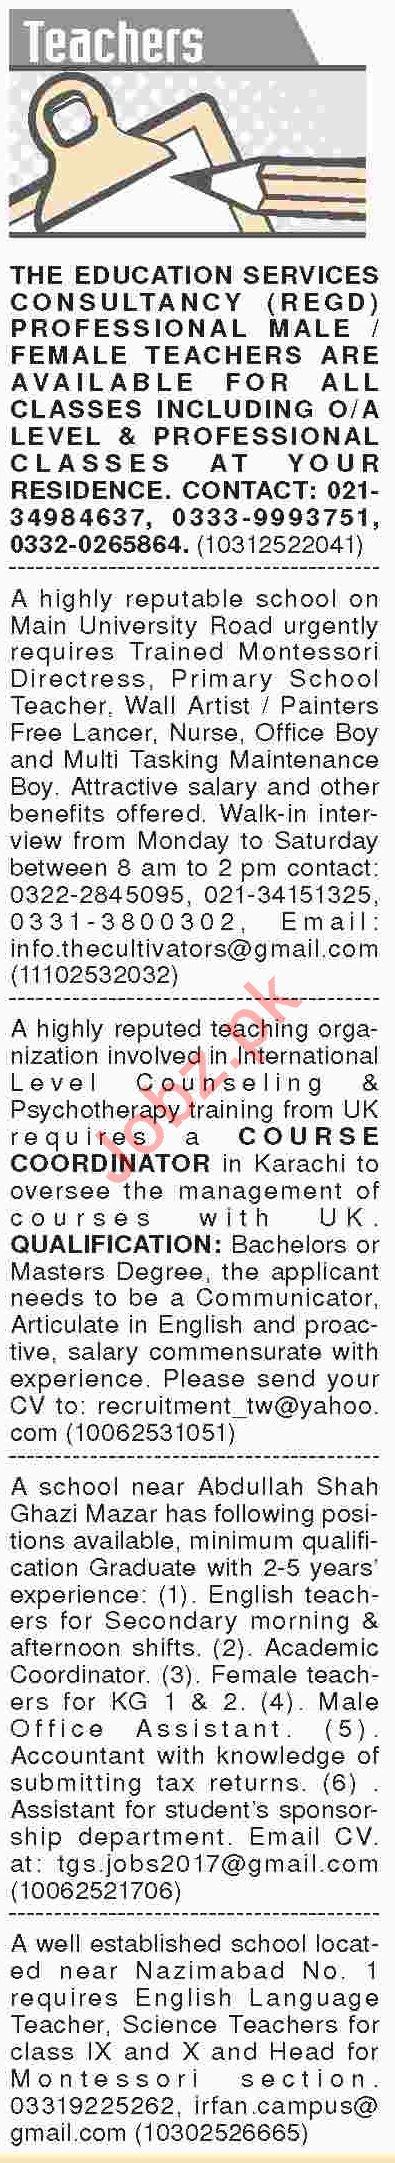 Dawn Sunday Classified Ads 10th Feb 2019 for Teaching Staff